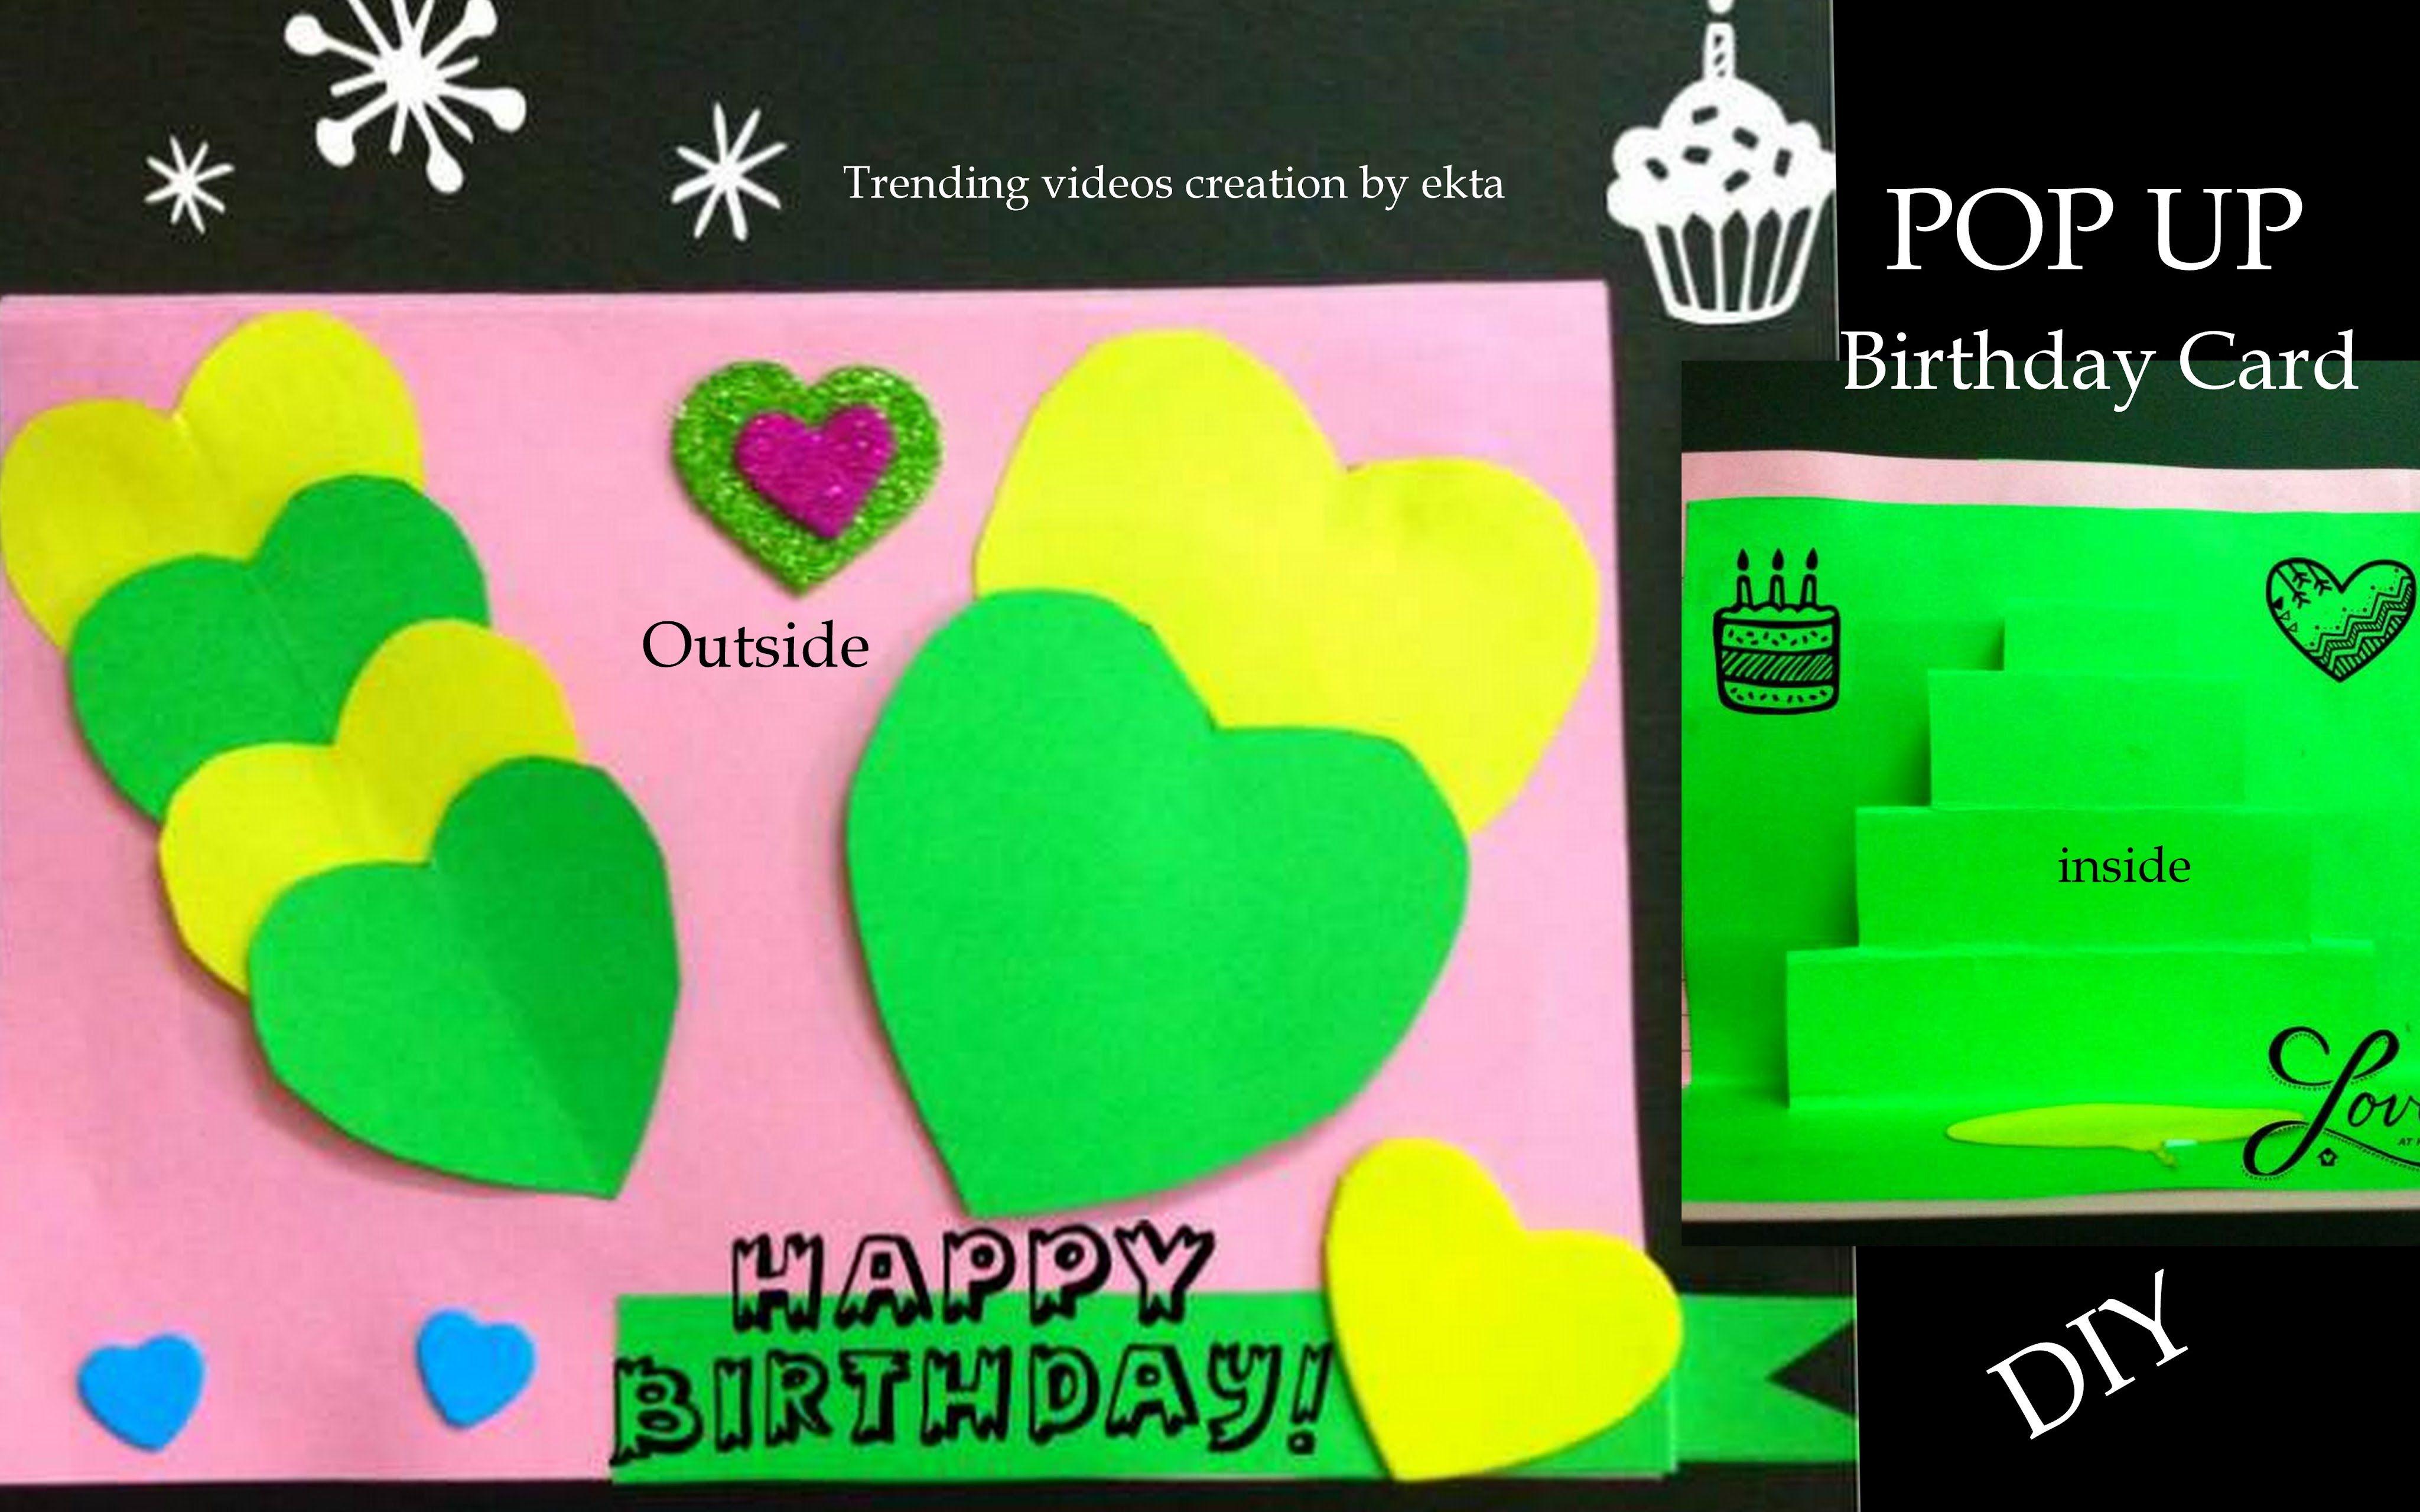 Birthday Card Paper And Handmade Beautiful Pop Up Card Tutorial Easy Diy Birthday Cards Birthday Cards Easy Birthday Cards Diy Card Tutorial